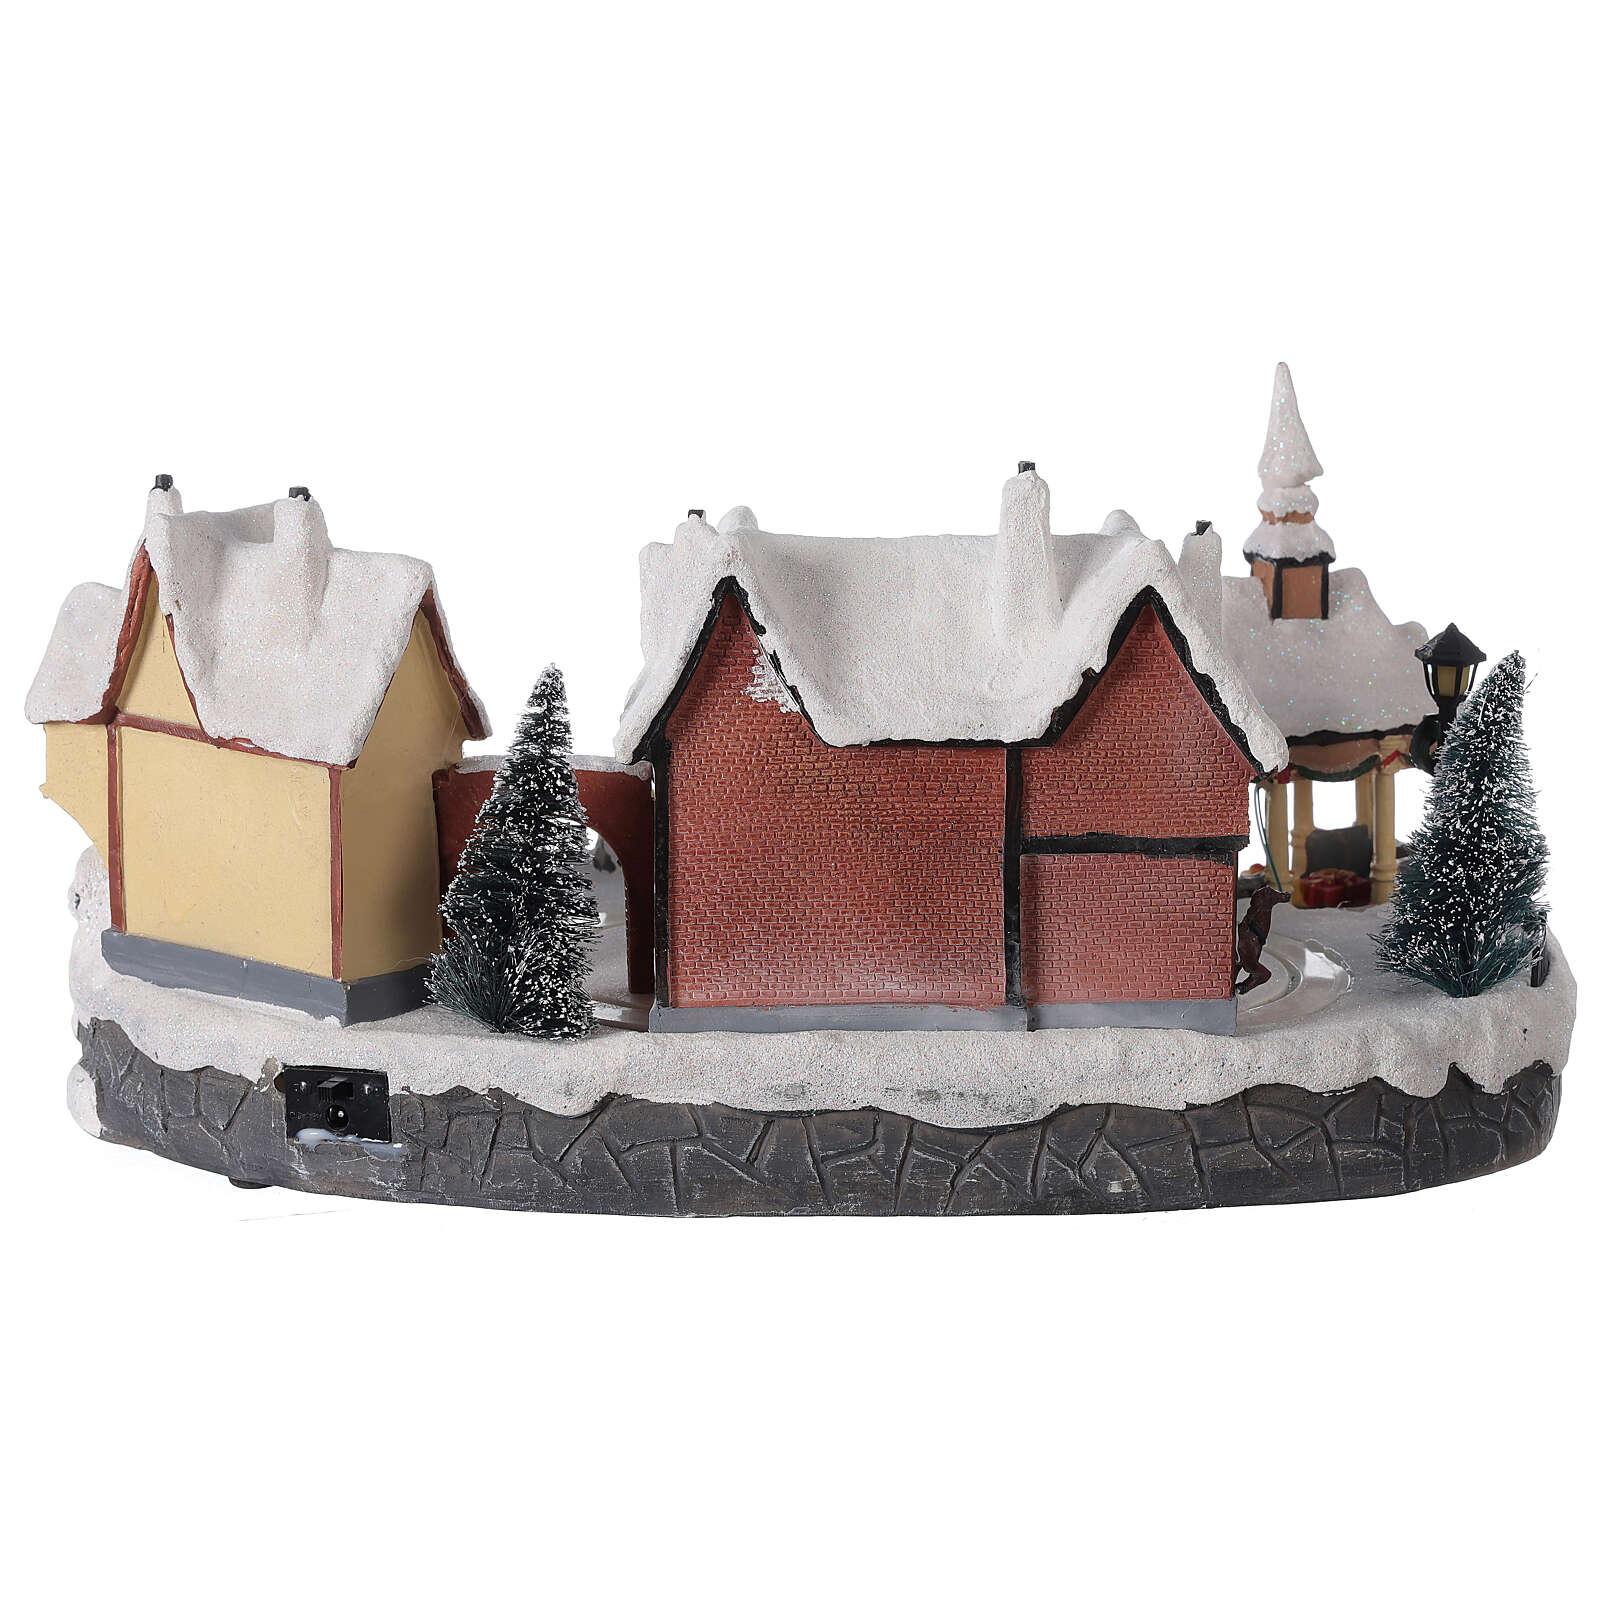 Christmas village snowy square LED lighting music 25x45x30 cm 3